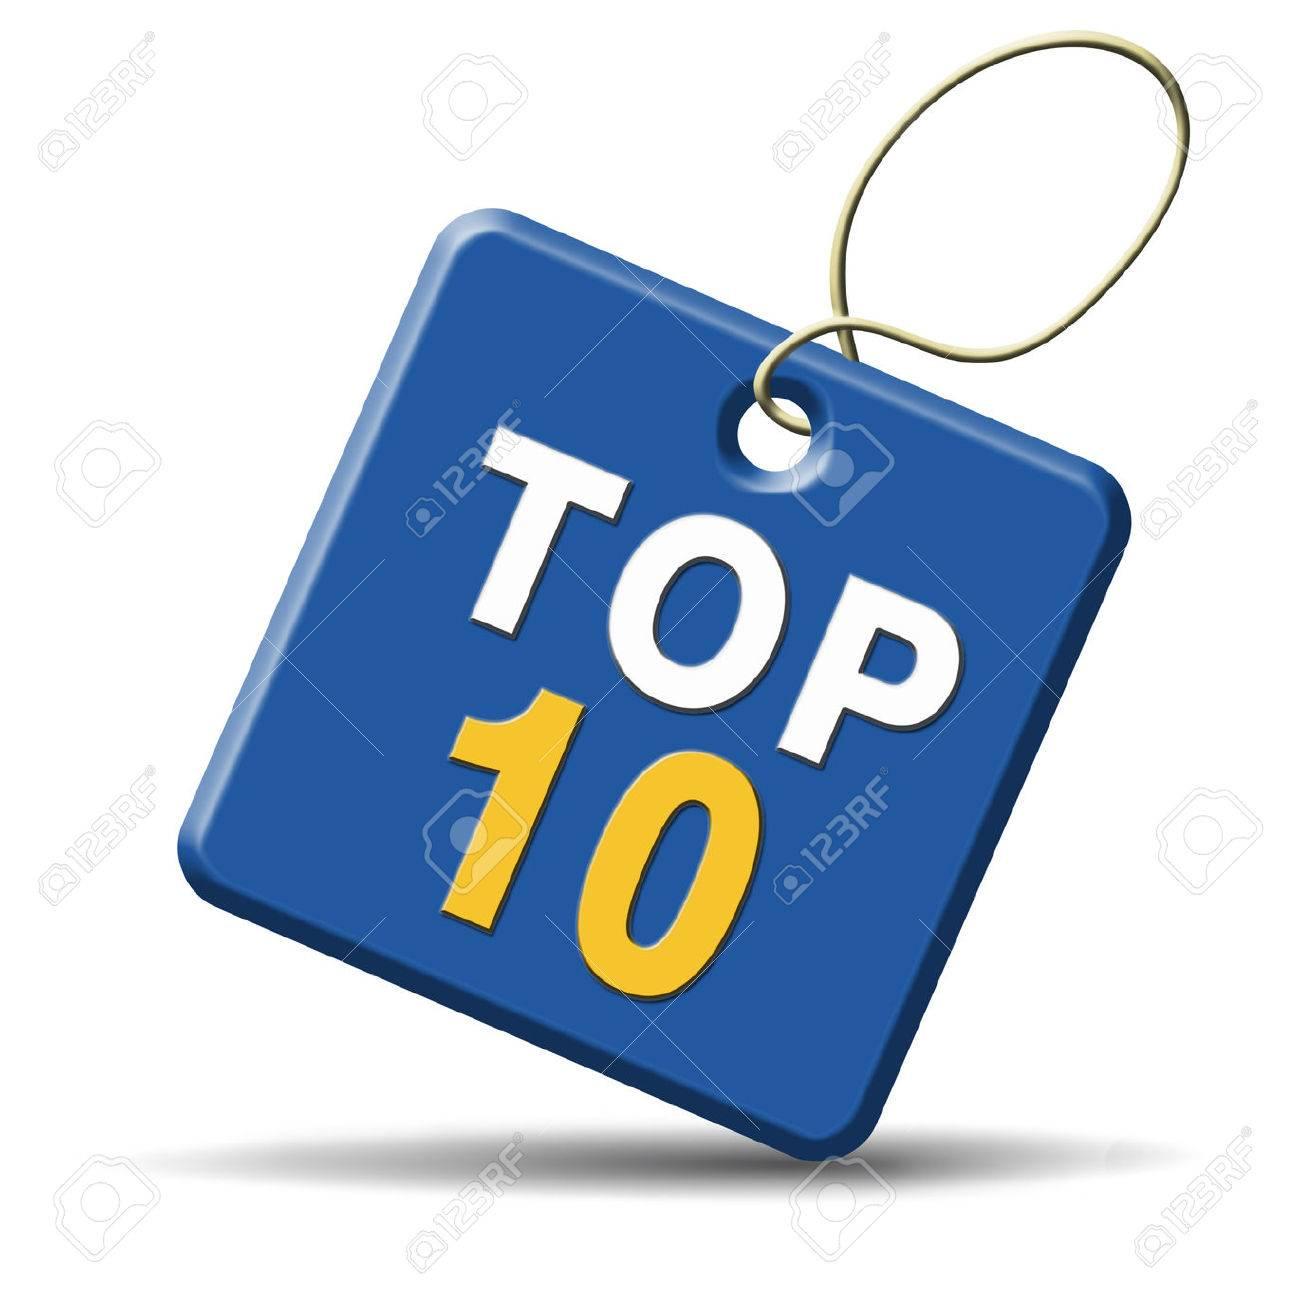 https://previews.123rf.com/images/dirkercken/dirkercken1310/dirkercken131000627/23187089-top-10-charts-list-pop-poll-result-and-award-winners-chart-ranking-music-hits-best-top-ten-quality-r-Stock-Photo.jpg